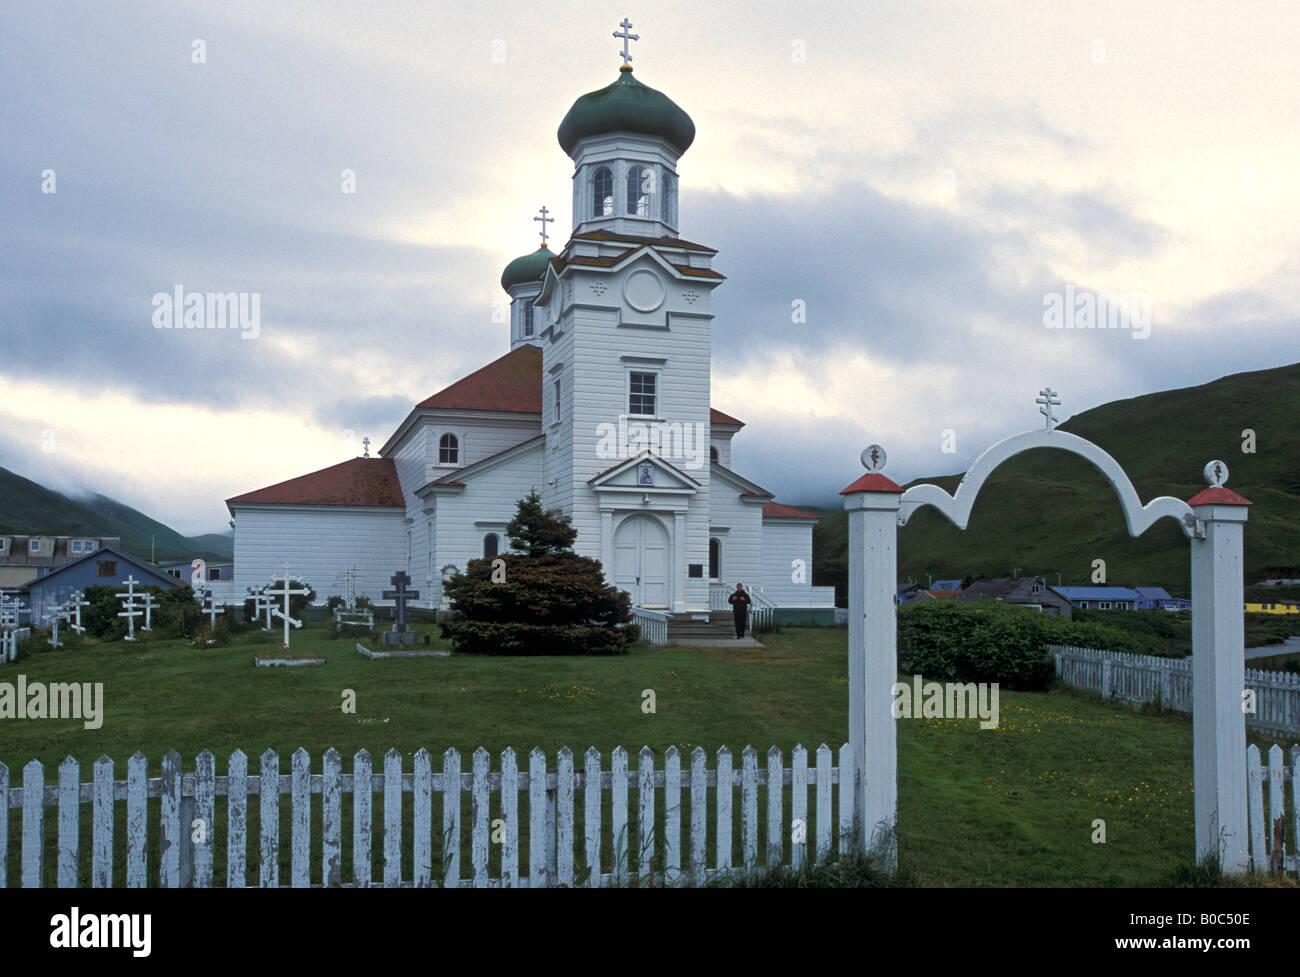 Grand aleutian dutch harbor alaska - Holy Ascension Russian Orthodox Church Dutch Harbor Unalaska Alaska Stock Image